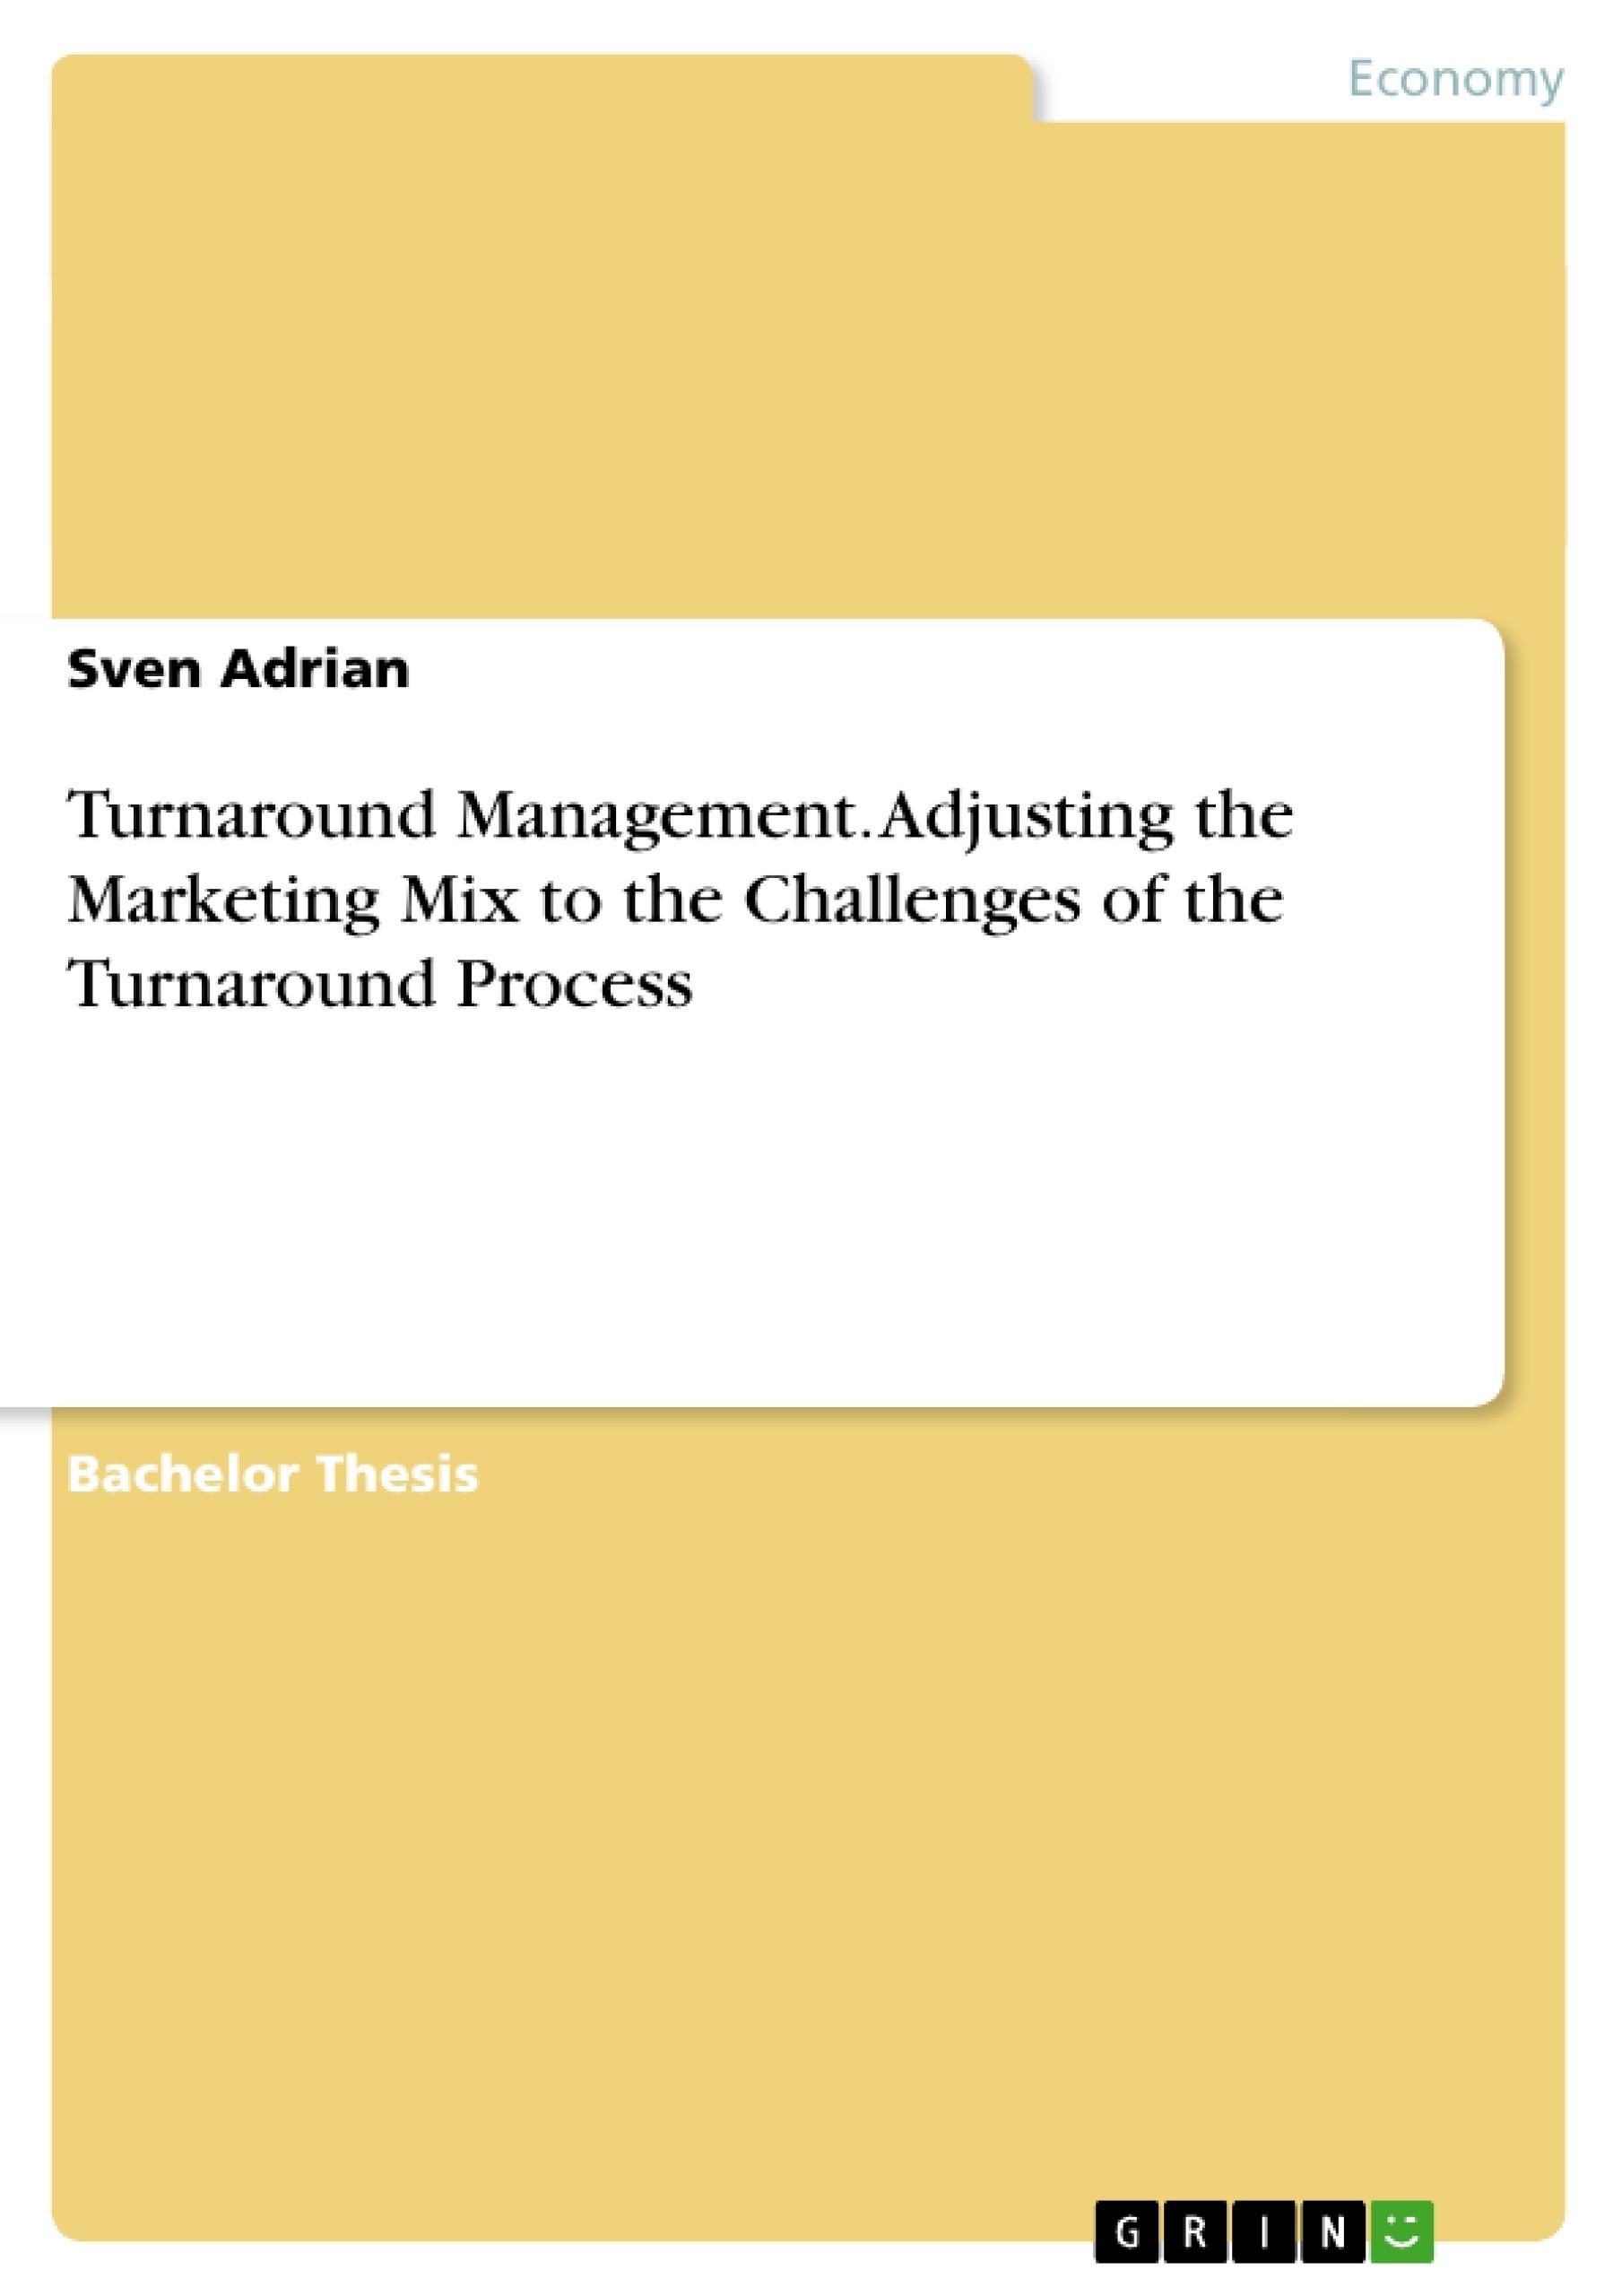 Marketing mix diploma thesis